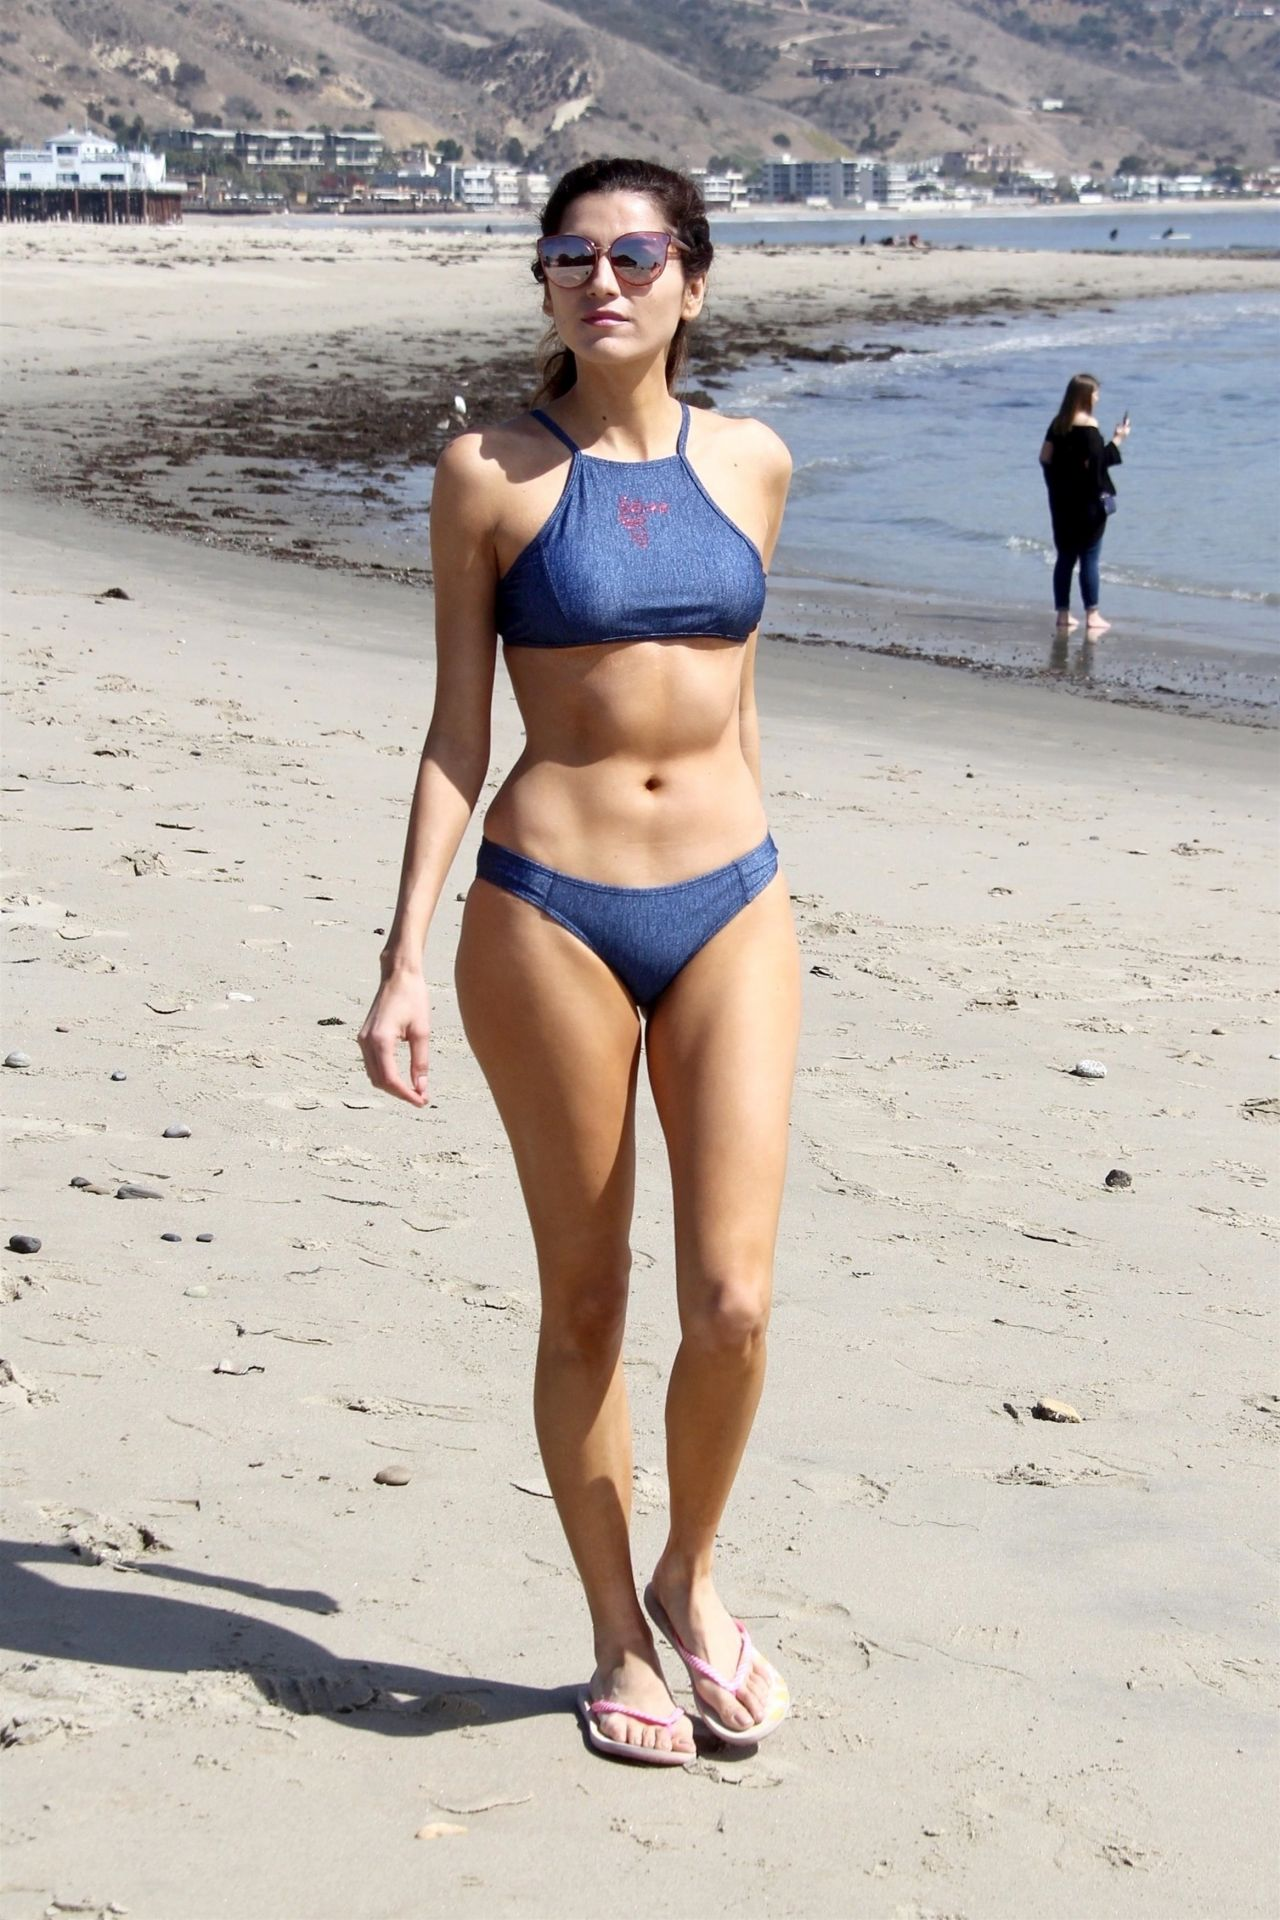 Bikini Blanca Blanco nudes (92 photos), Ass, Sideboobs, Boobs, butt 2019